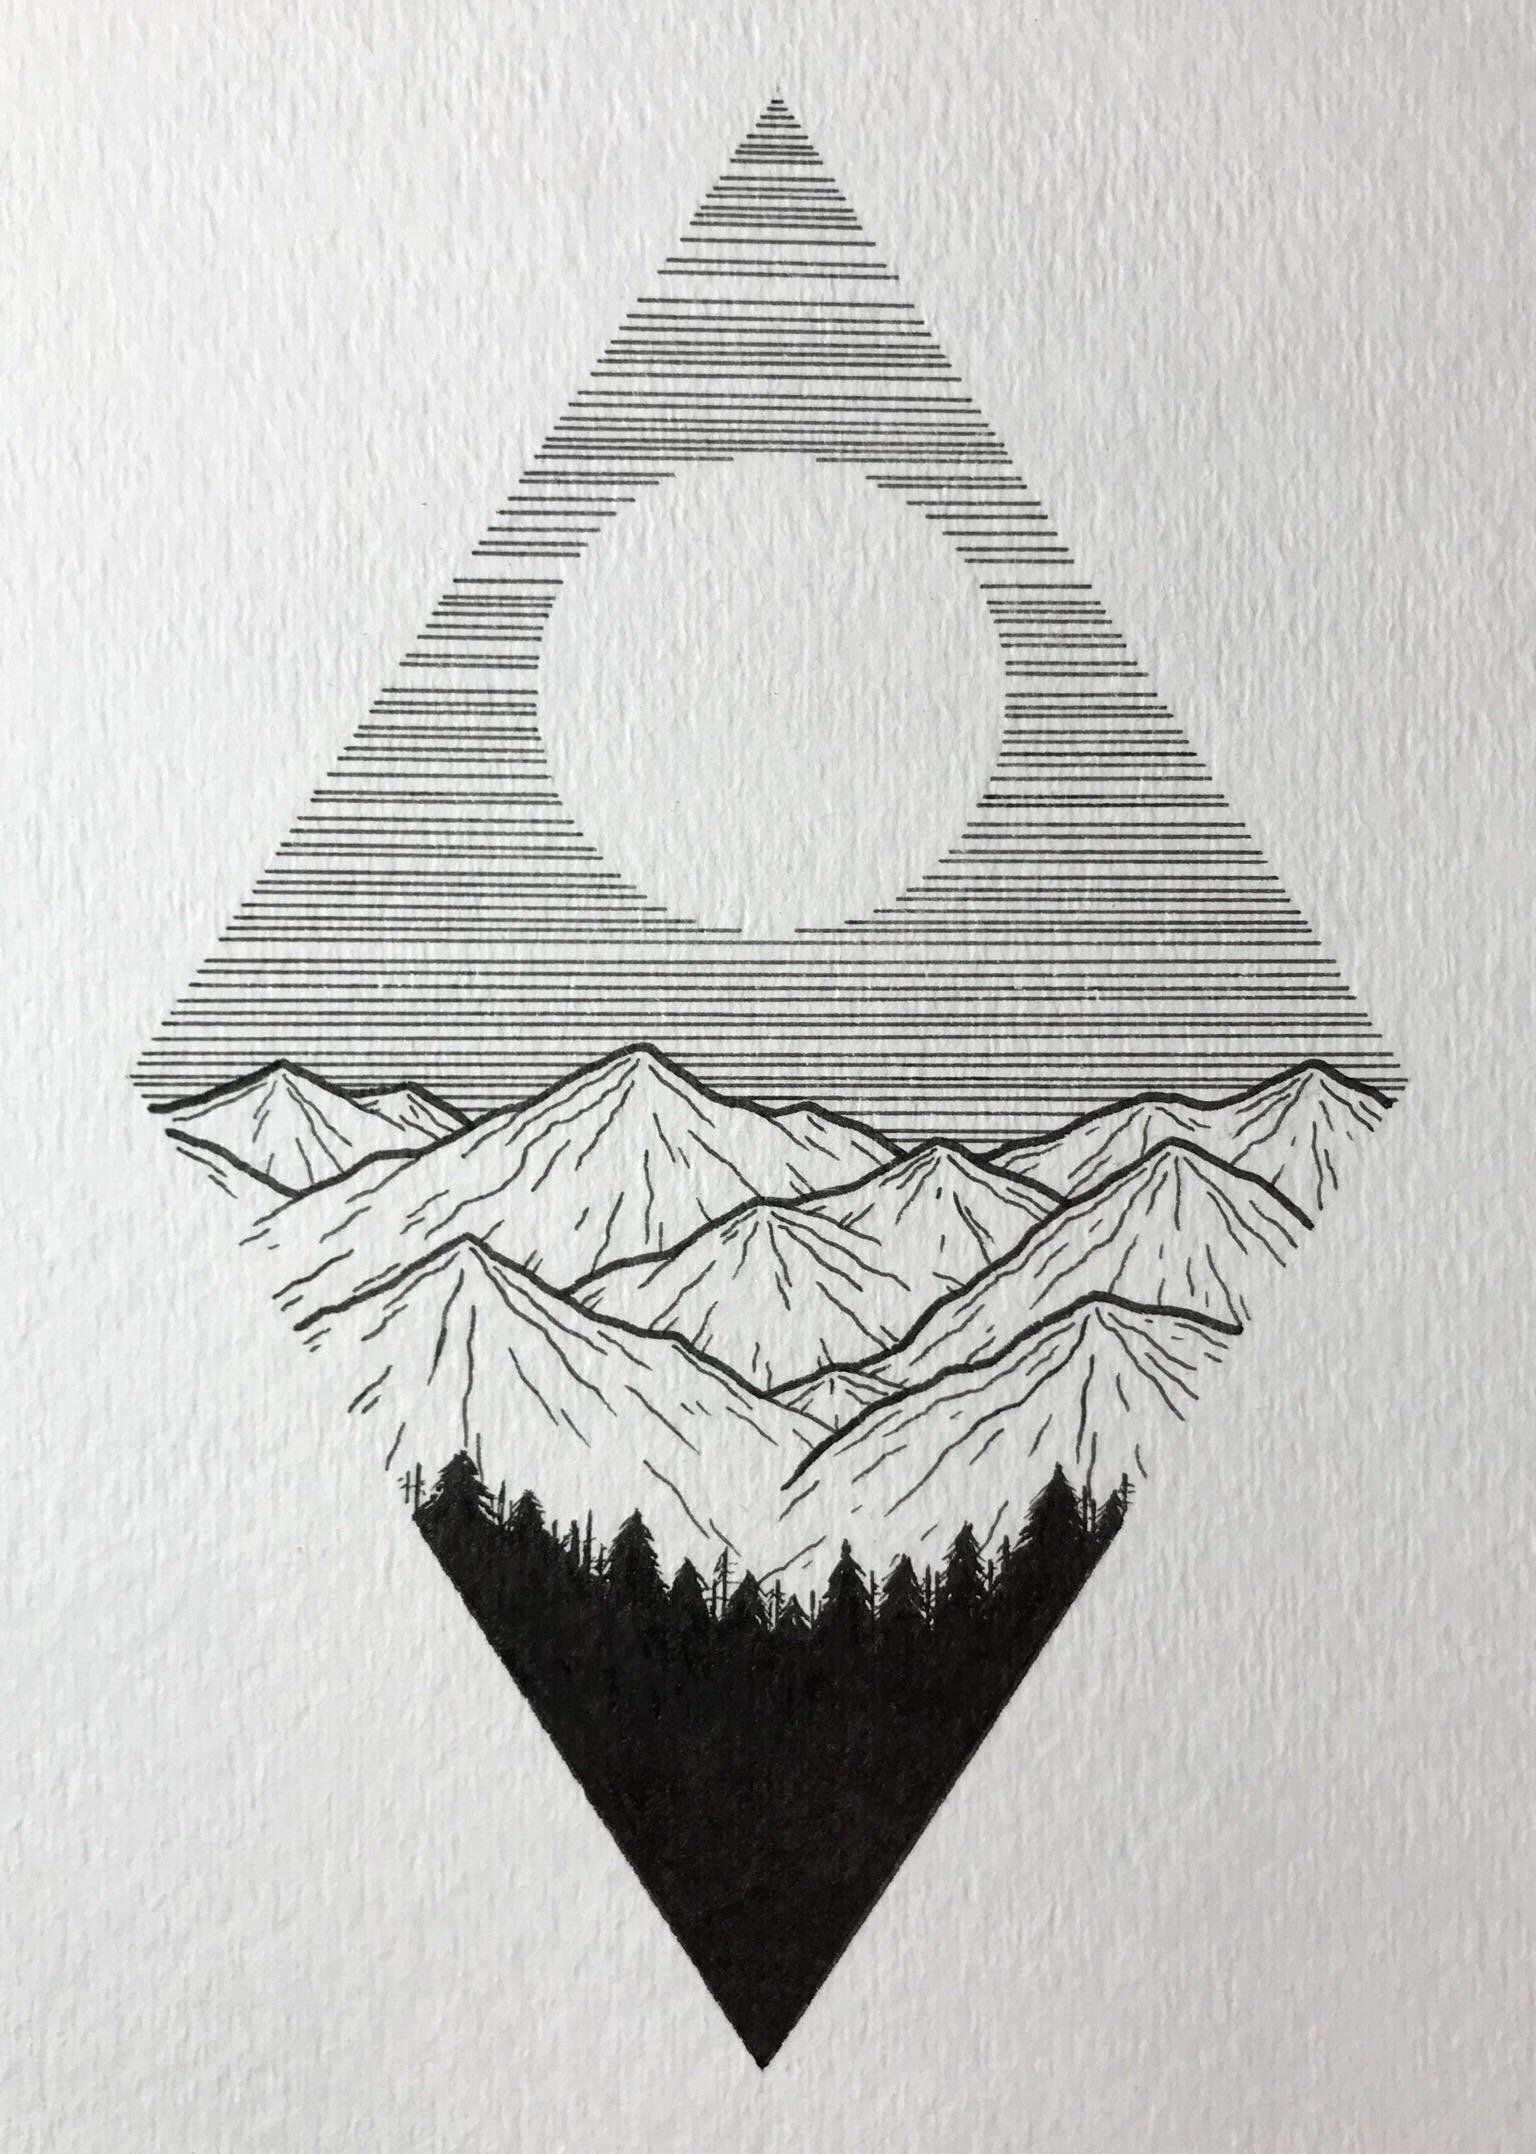 Linework Art Sketch - Linework Art Sketch